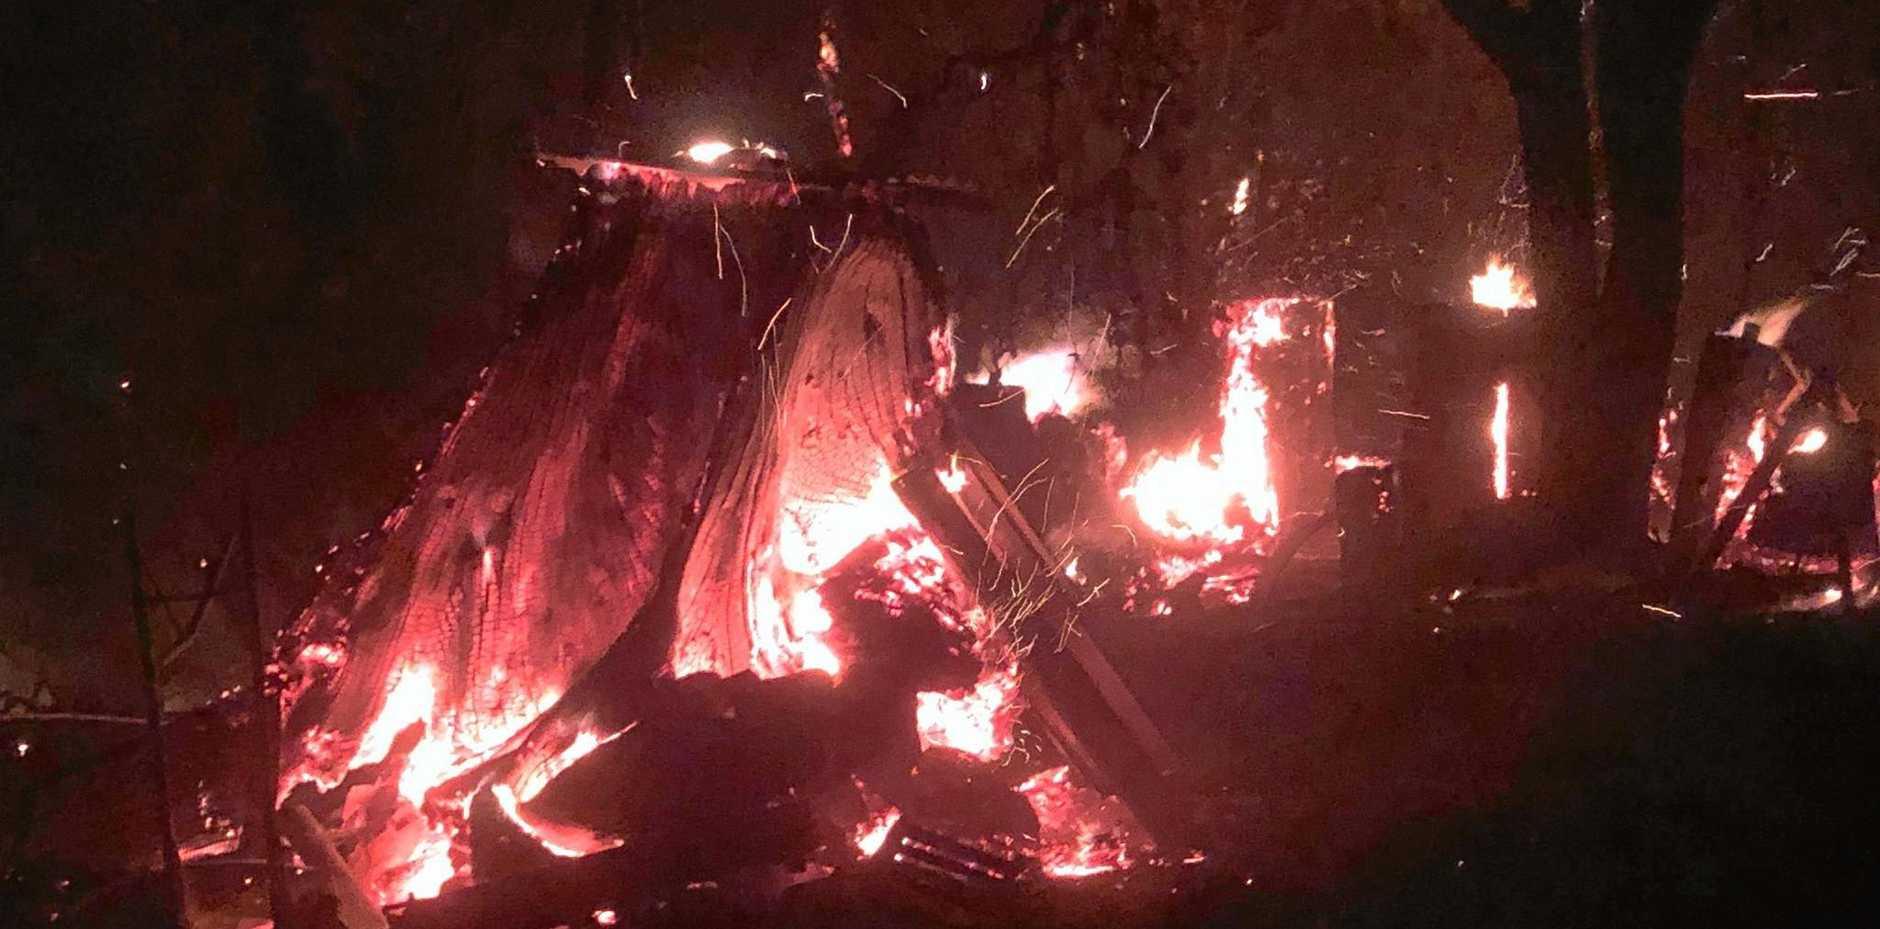 The bush fire near Nymboida about to cross Glens Creek Rd near Nymboida Friday night.